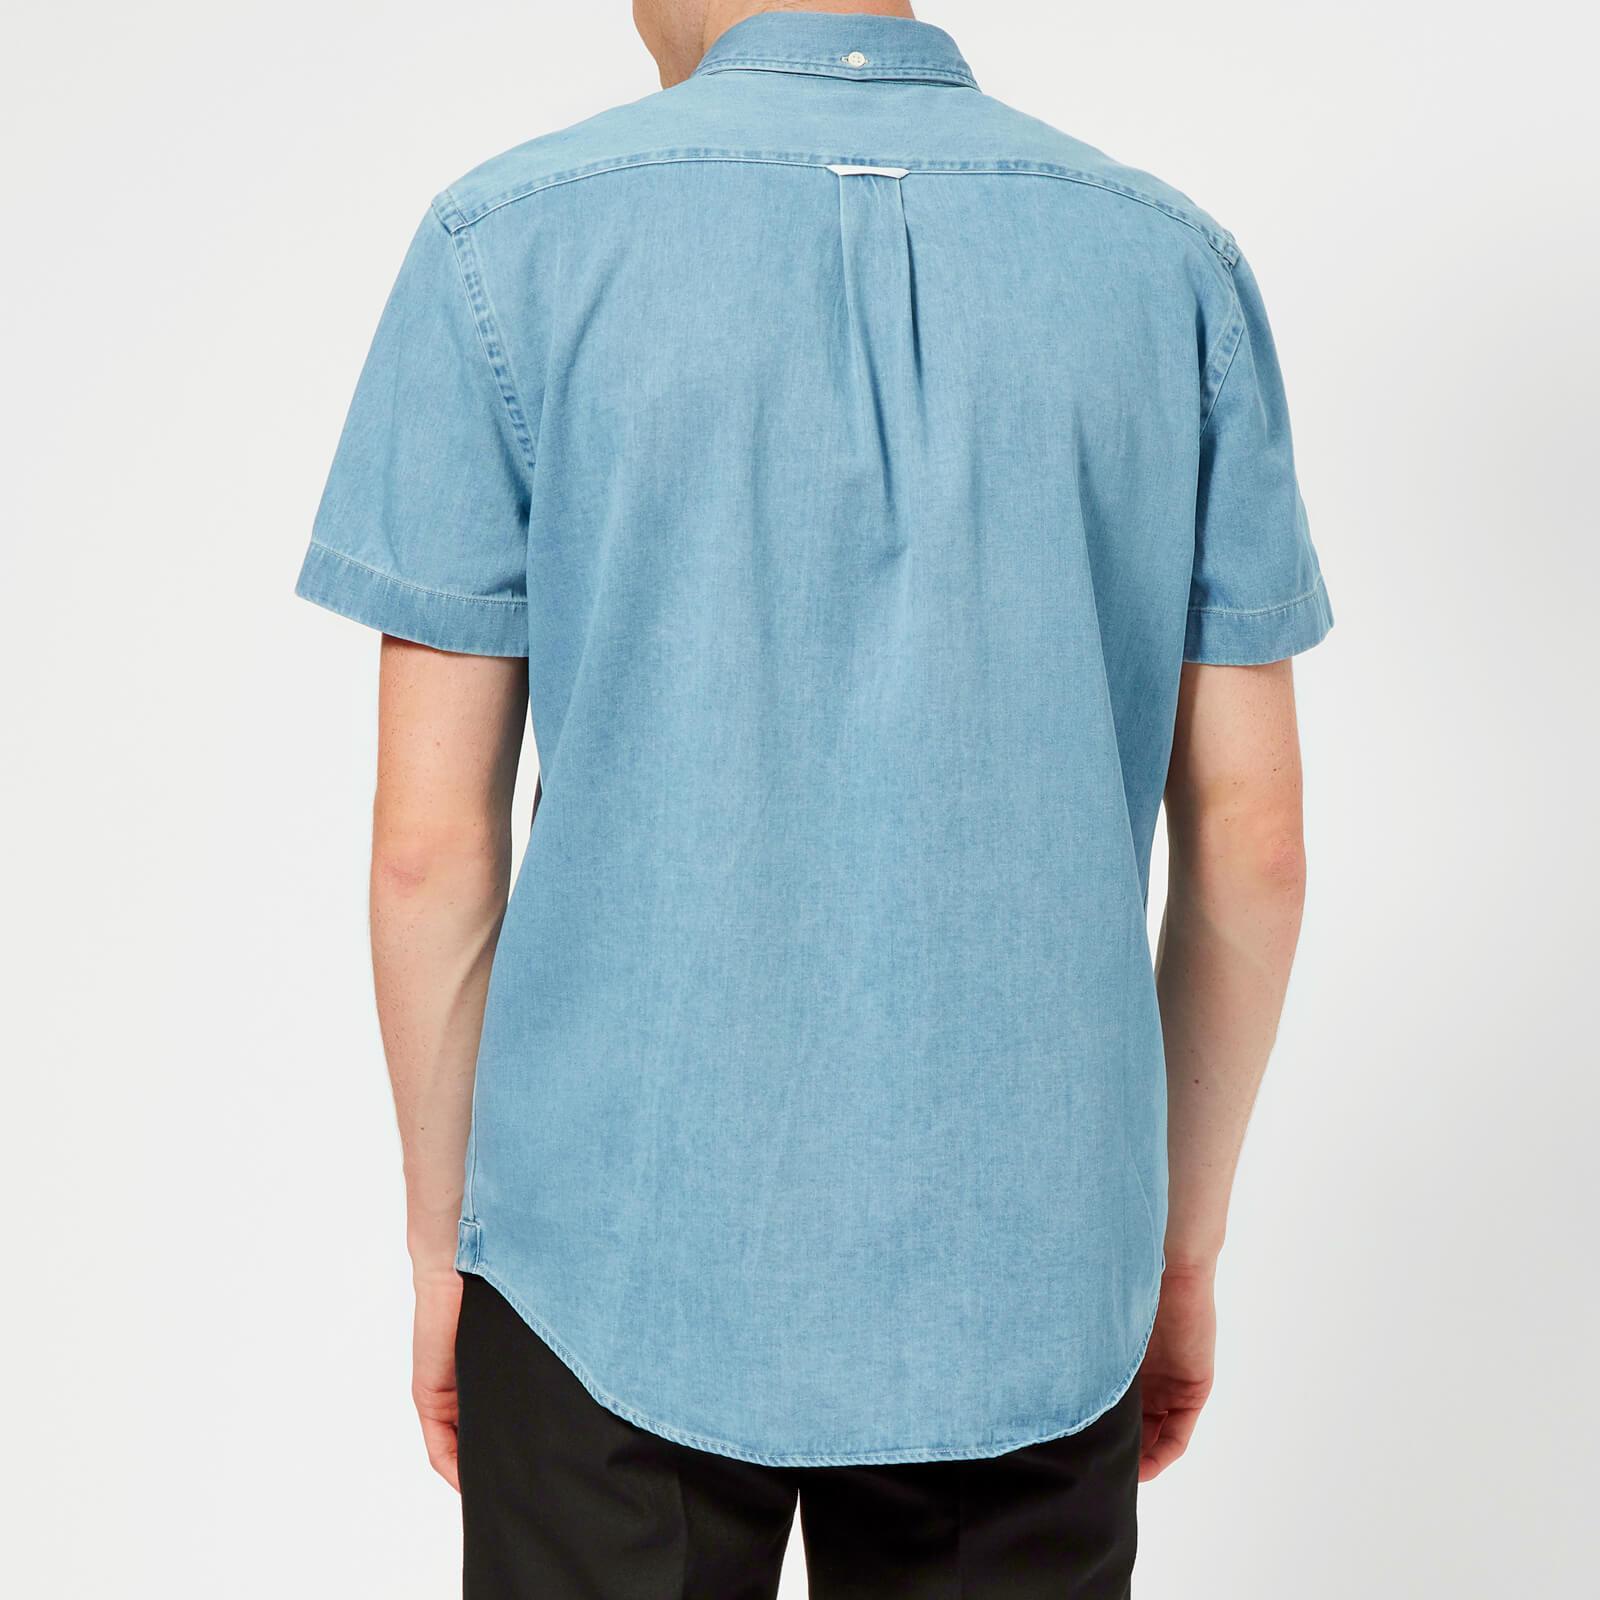 57702b208f Acne - Blue Isherwood Short Sleeve Denim Shirt for Men - Lyst. View  fullscreen